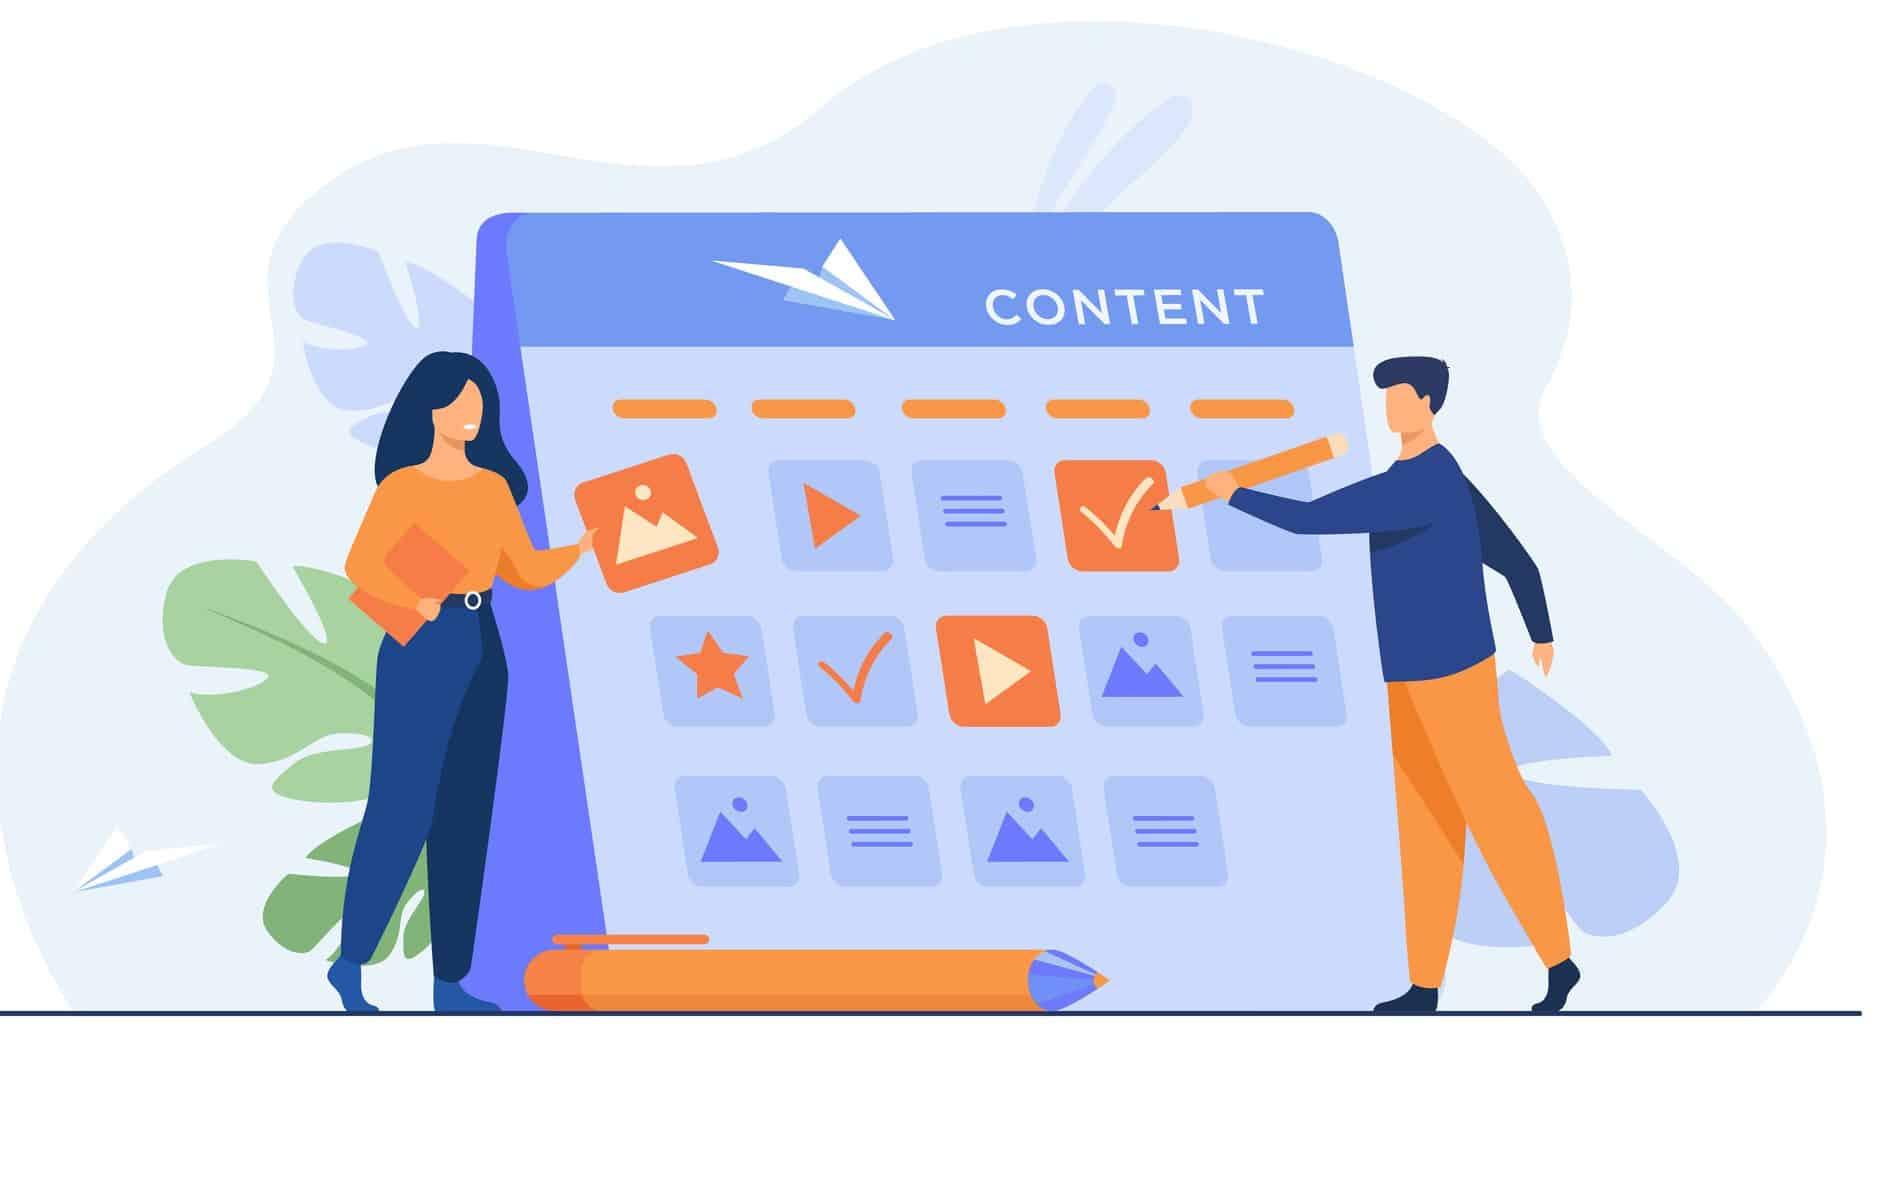 People making social media content calendar illustration